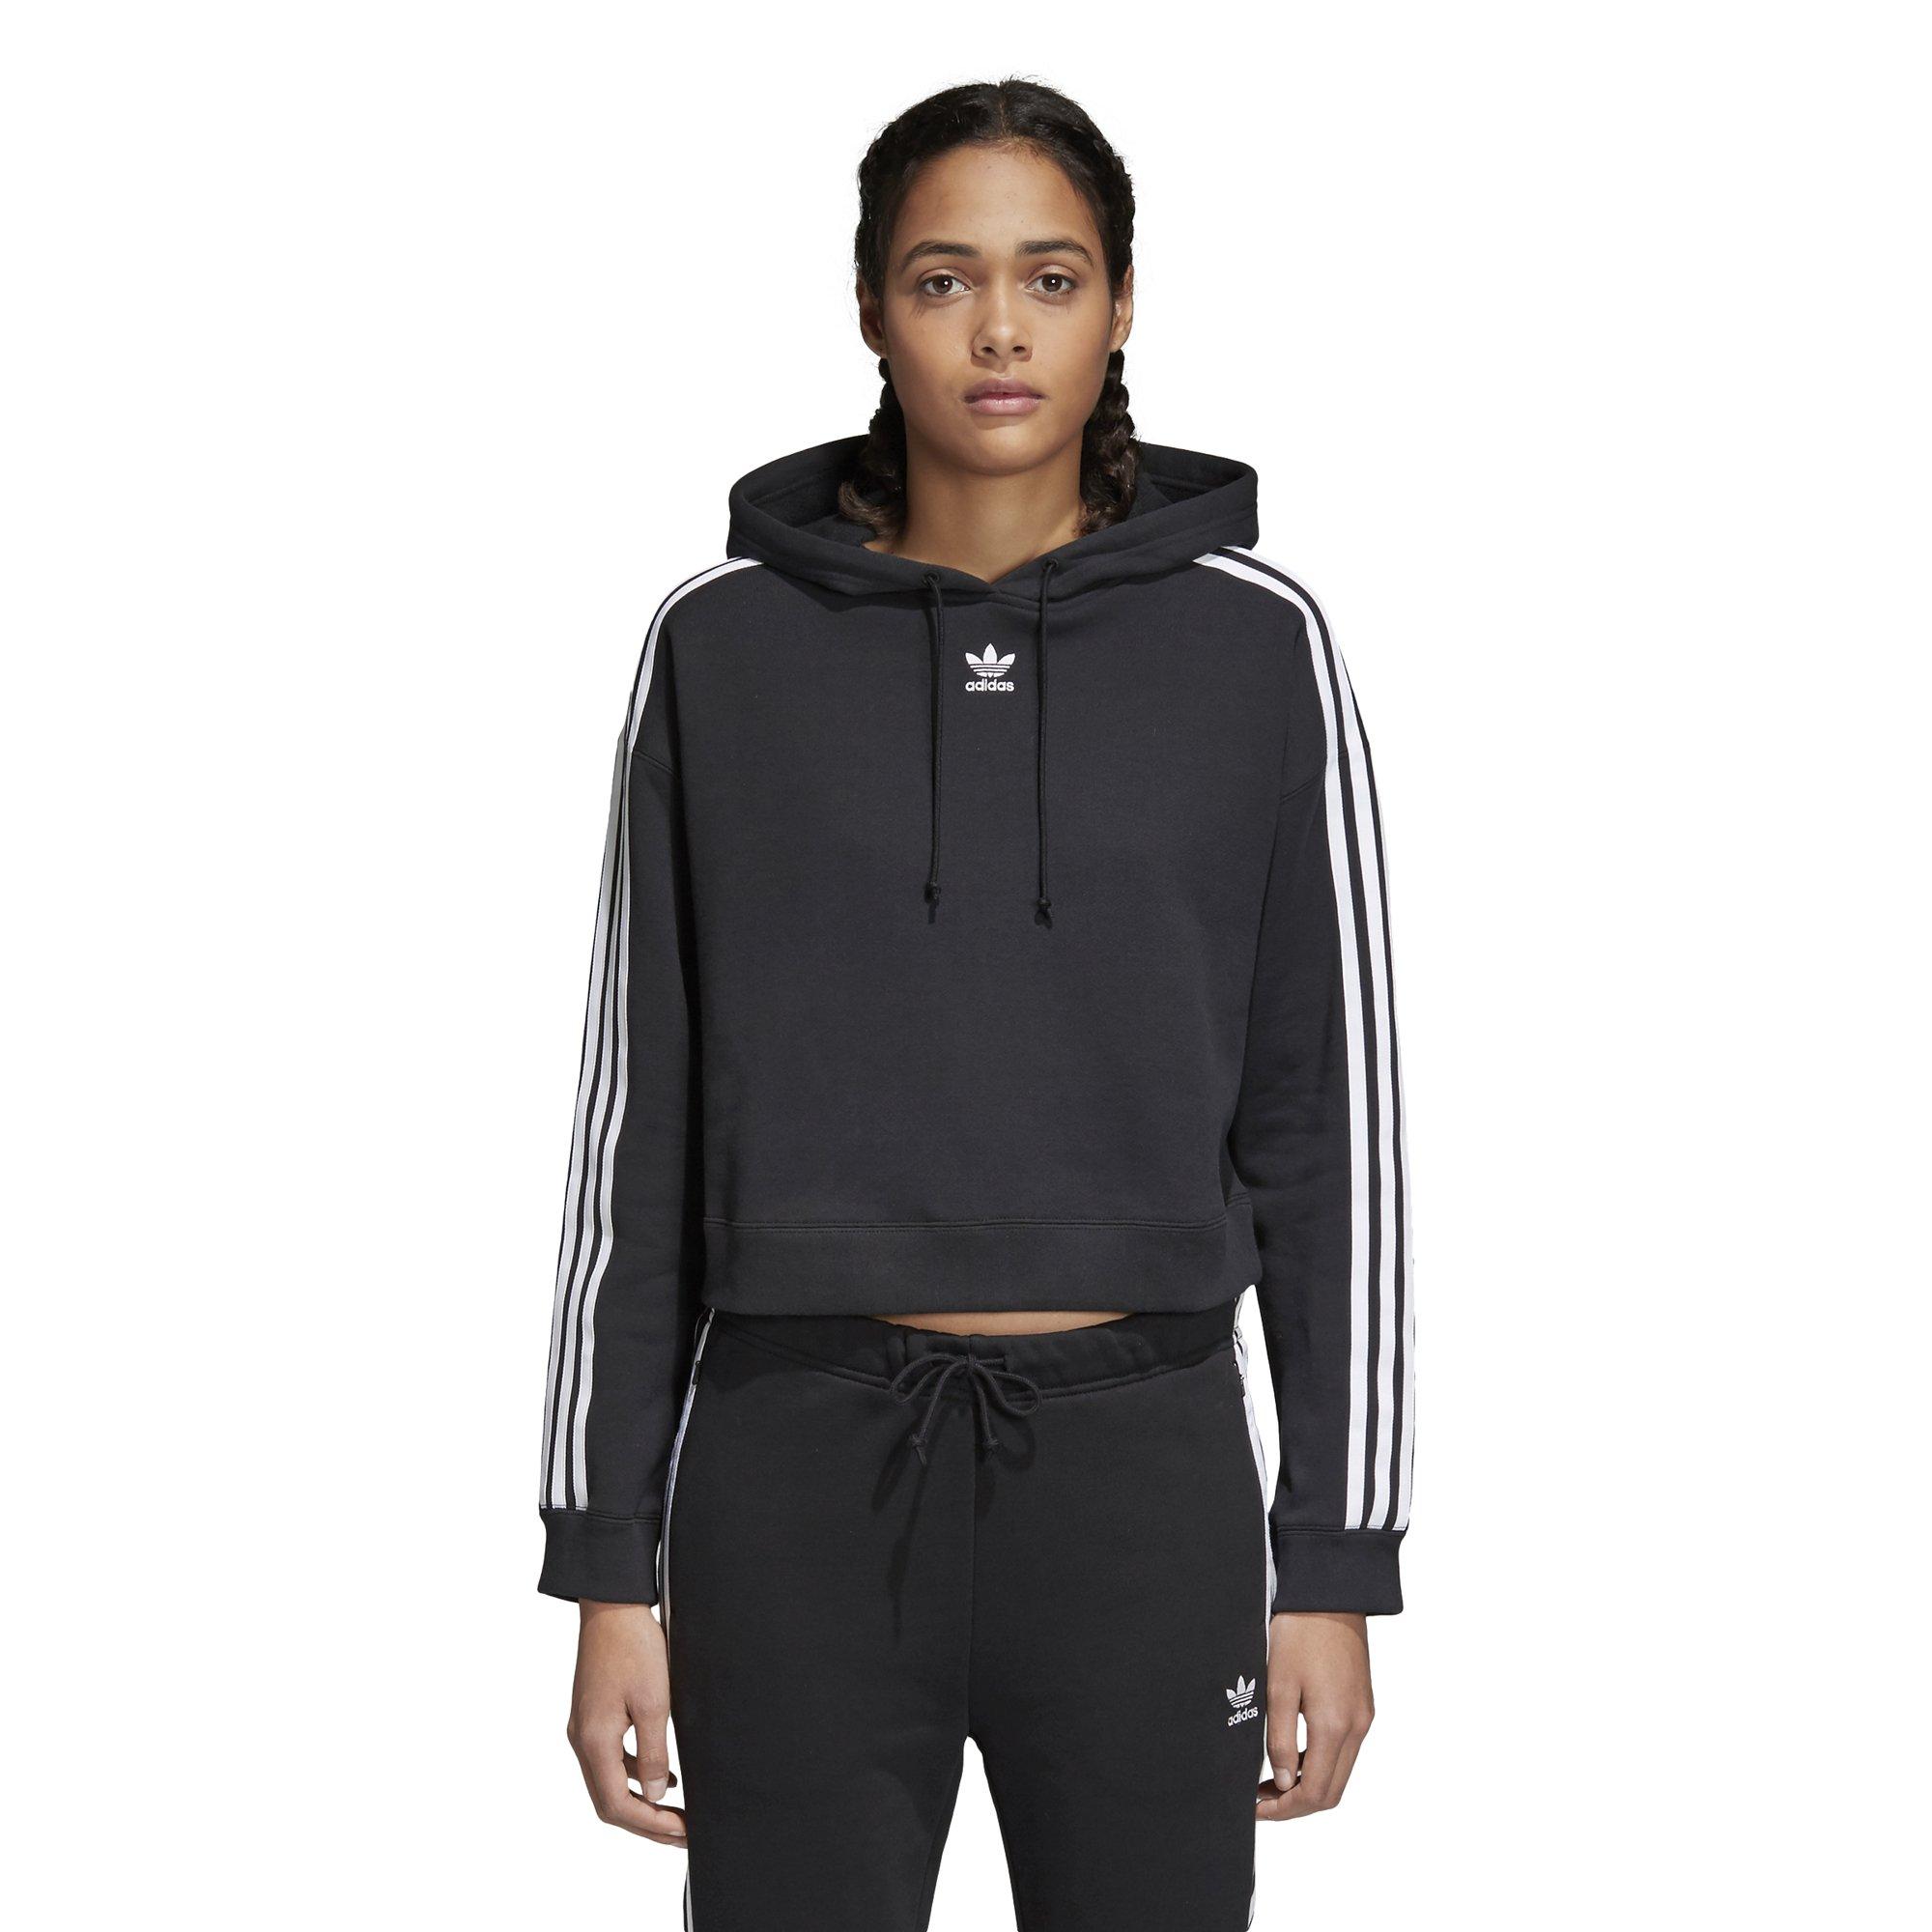 adidas Originals Women's Cropped Hoodie, Black, S